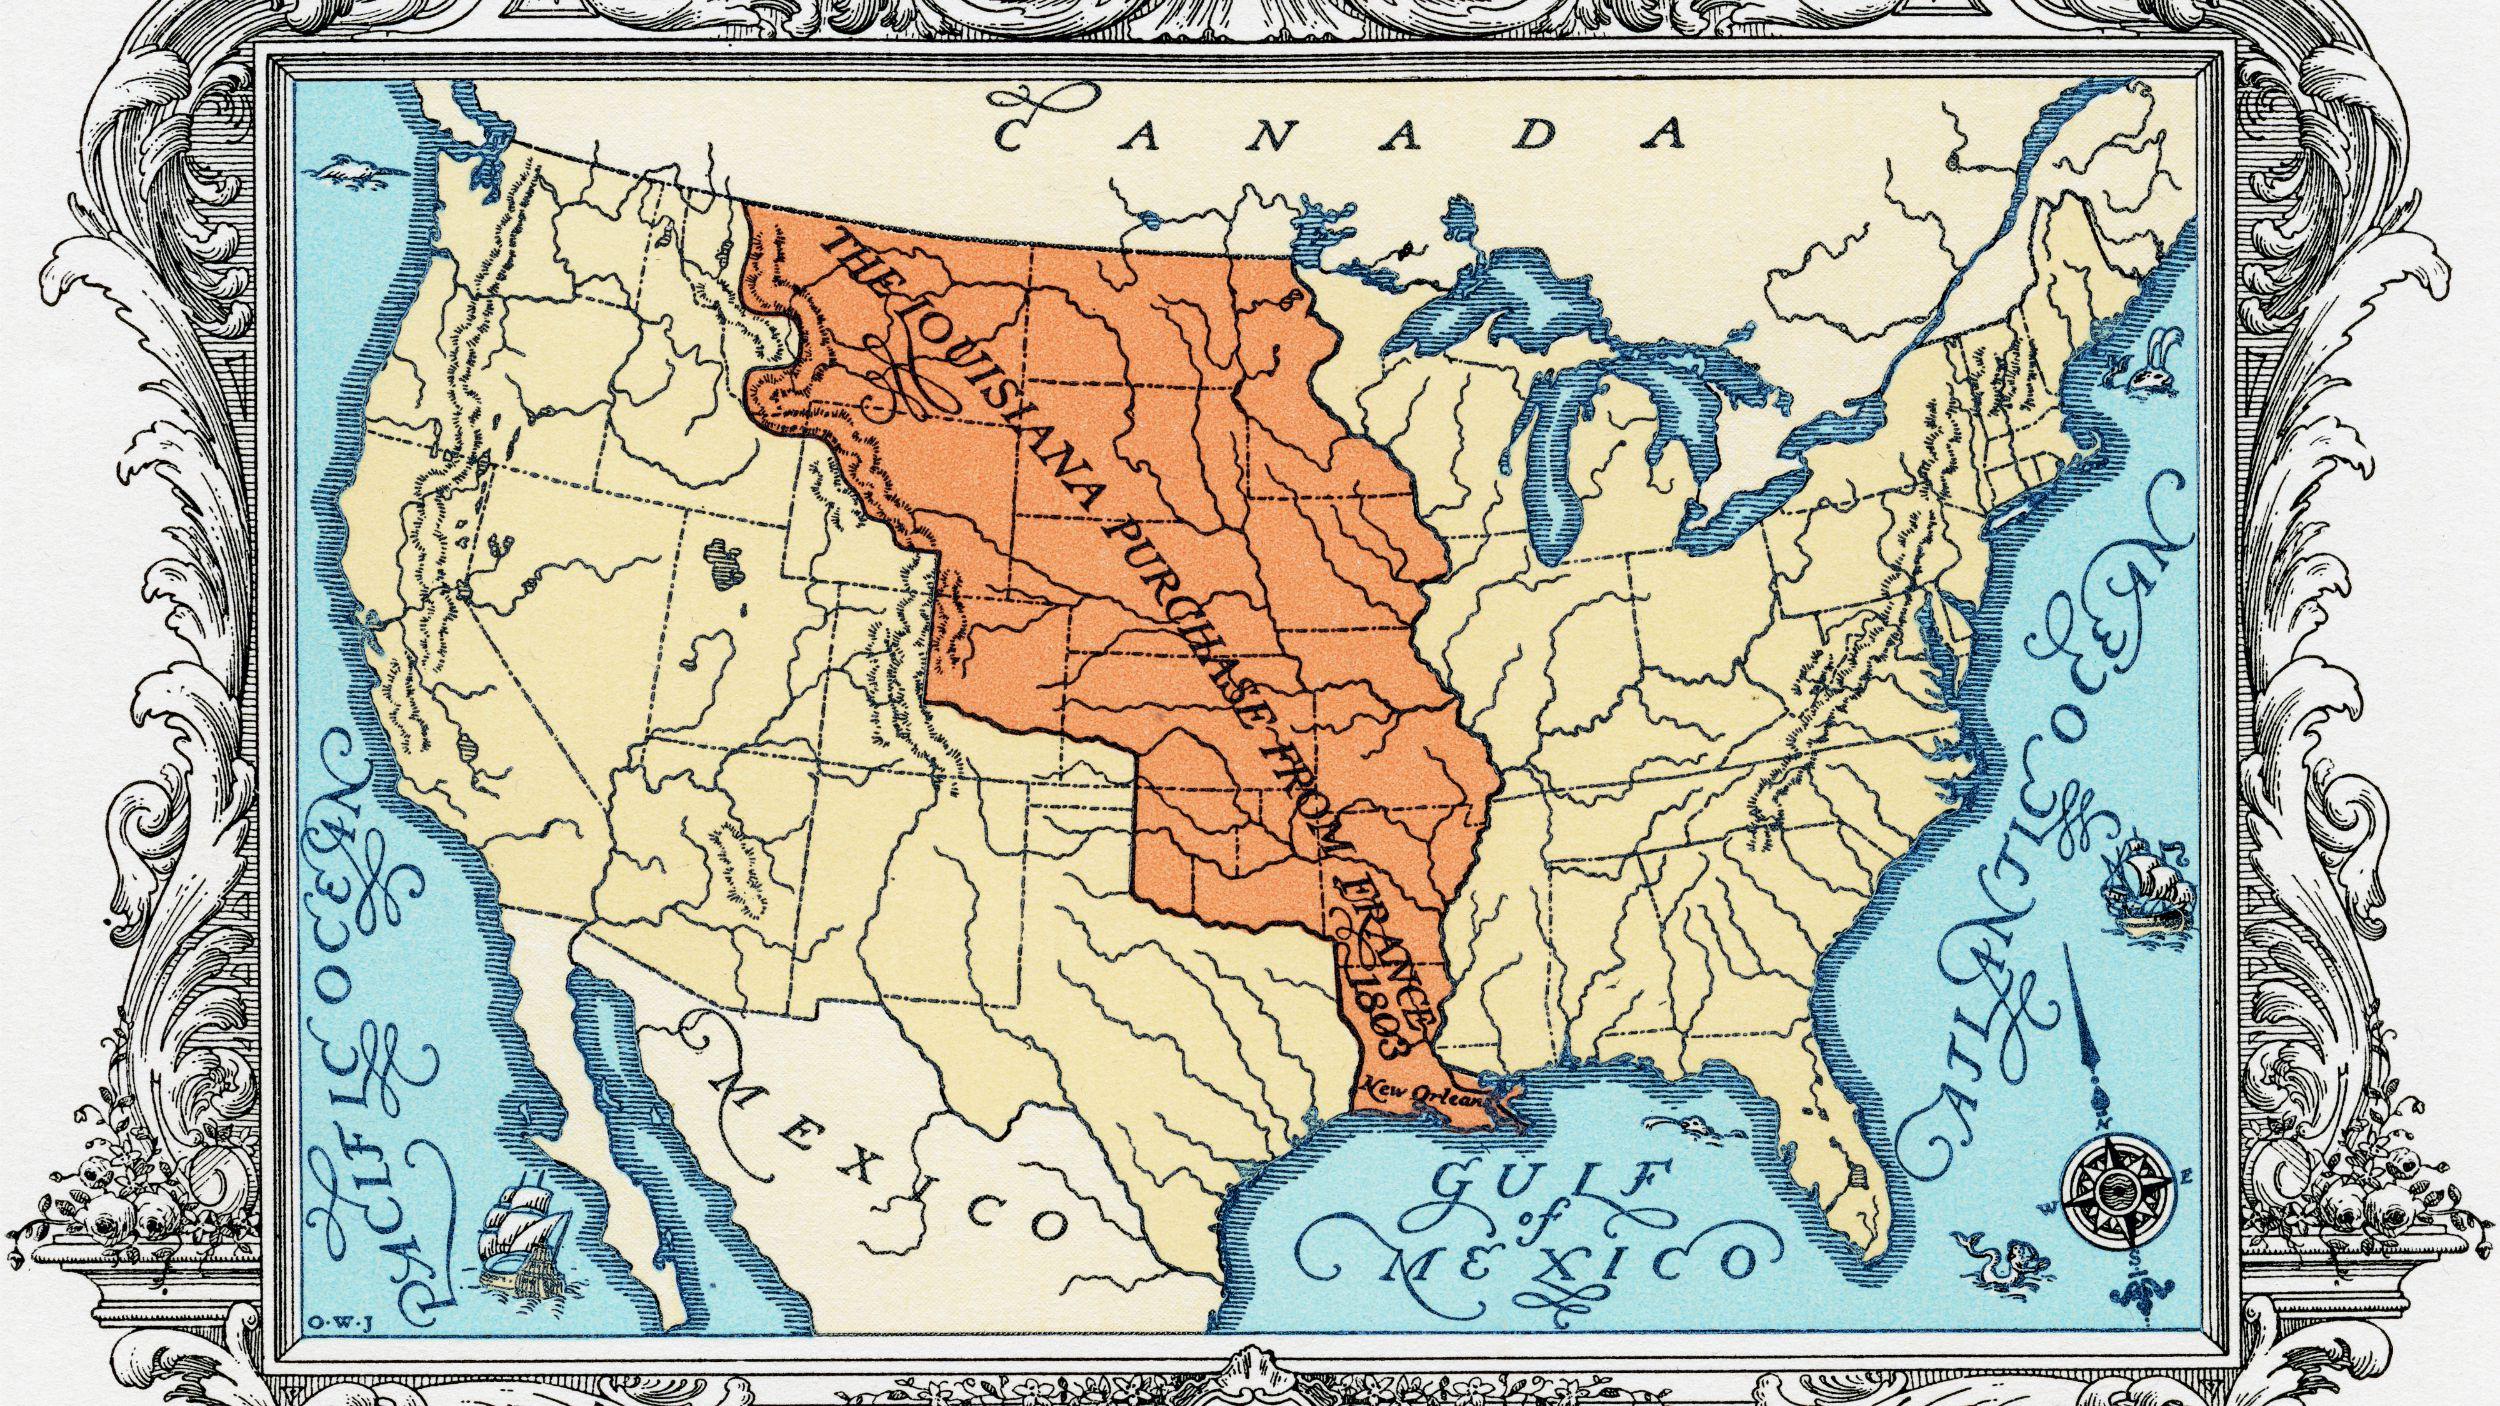 Thomas Jefferson and the Louisiana Purchase on